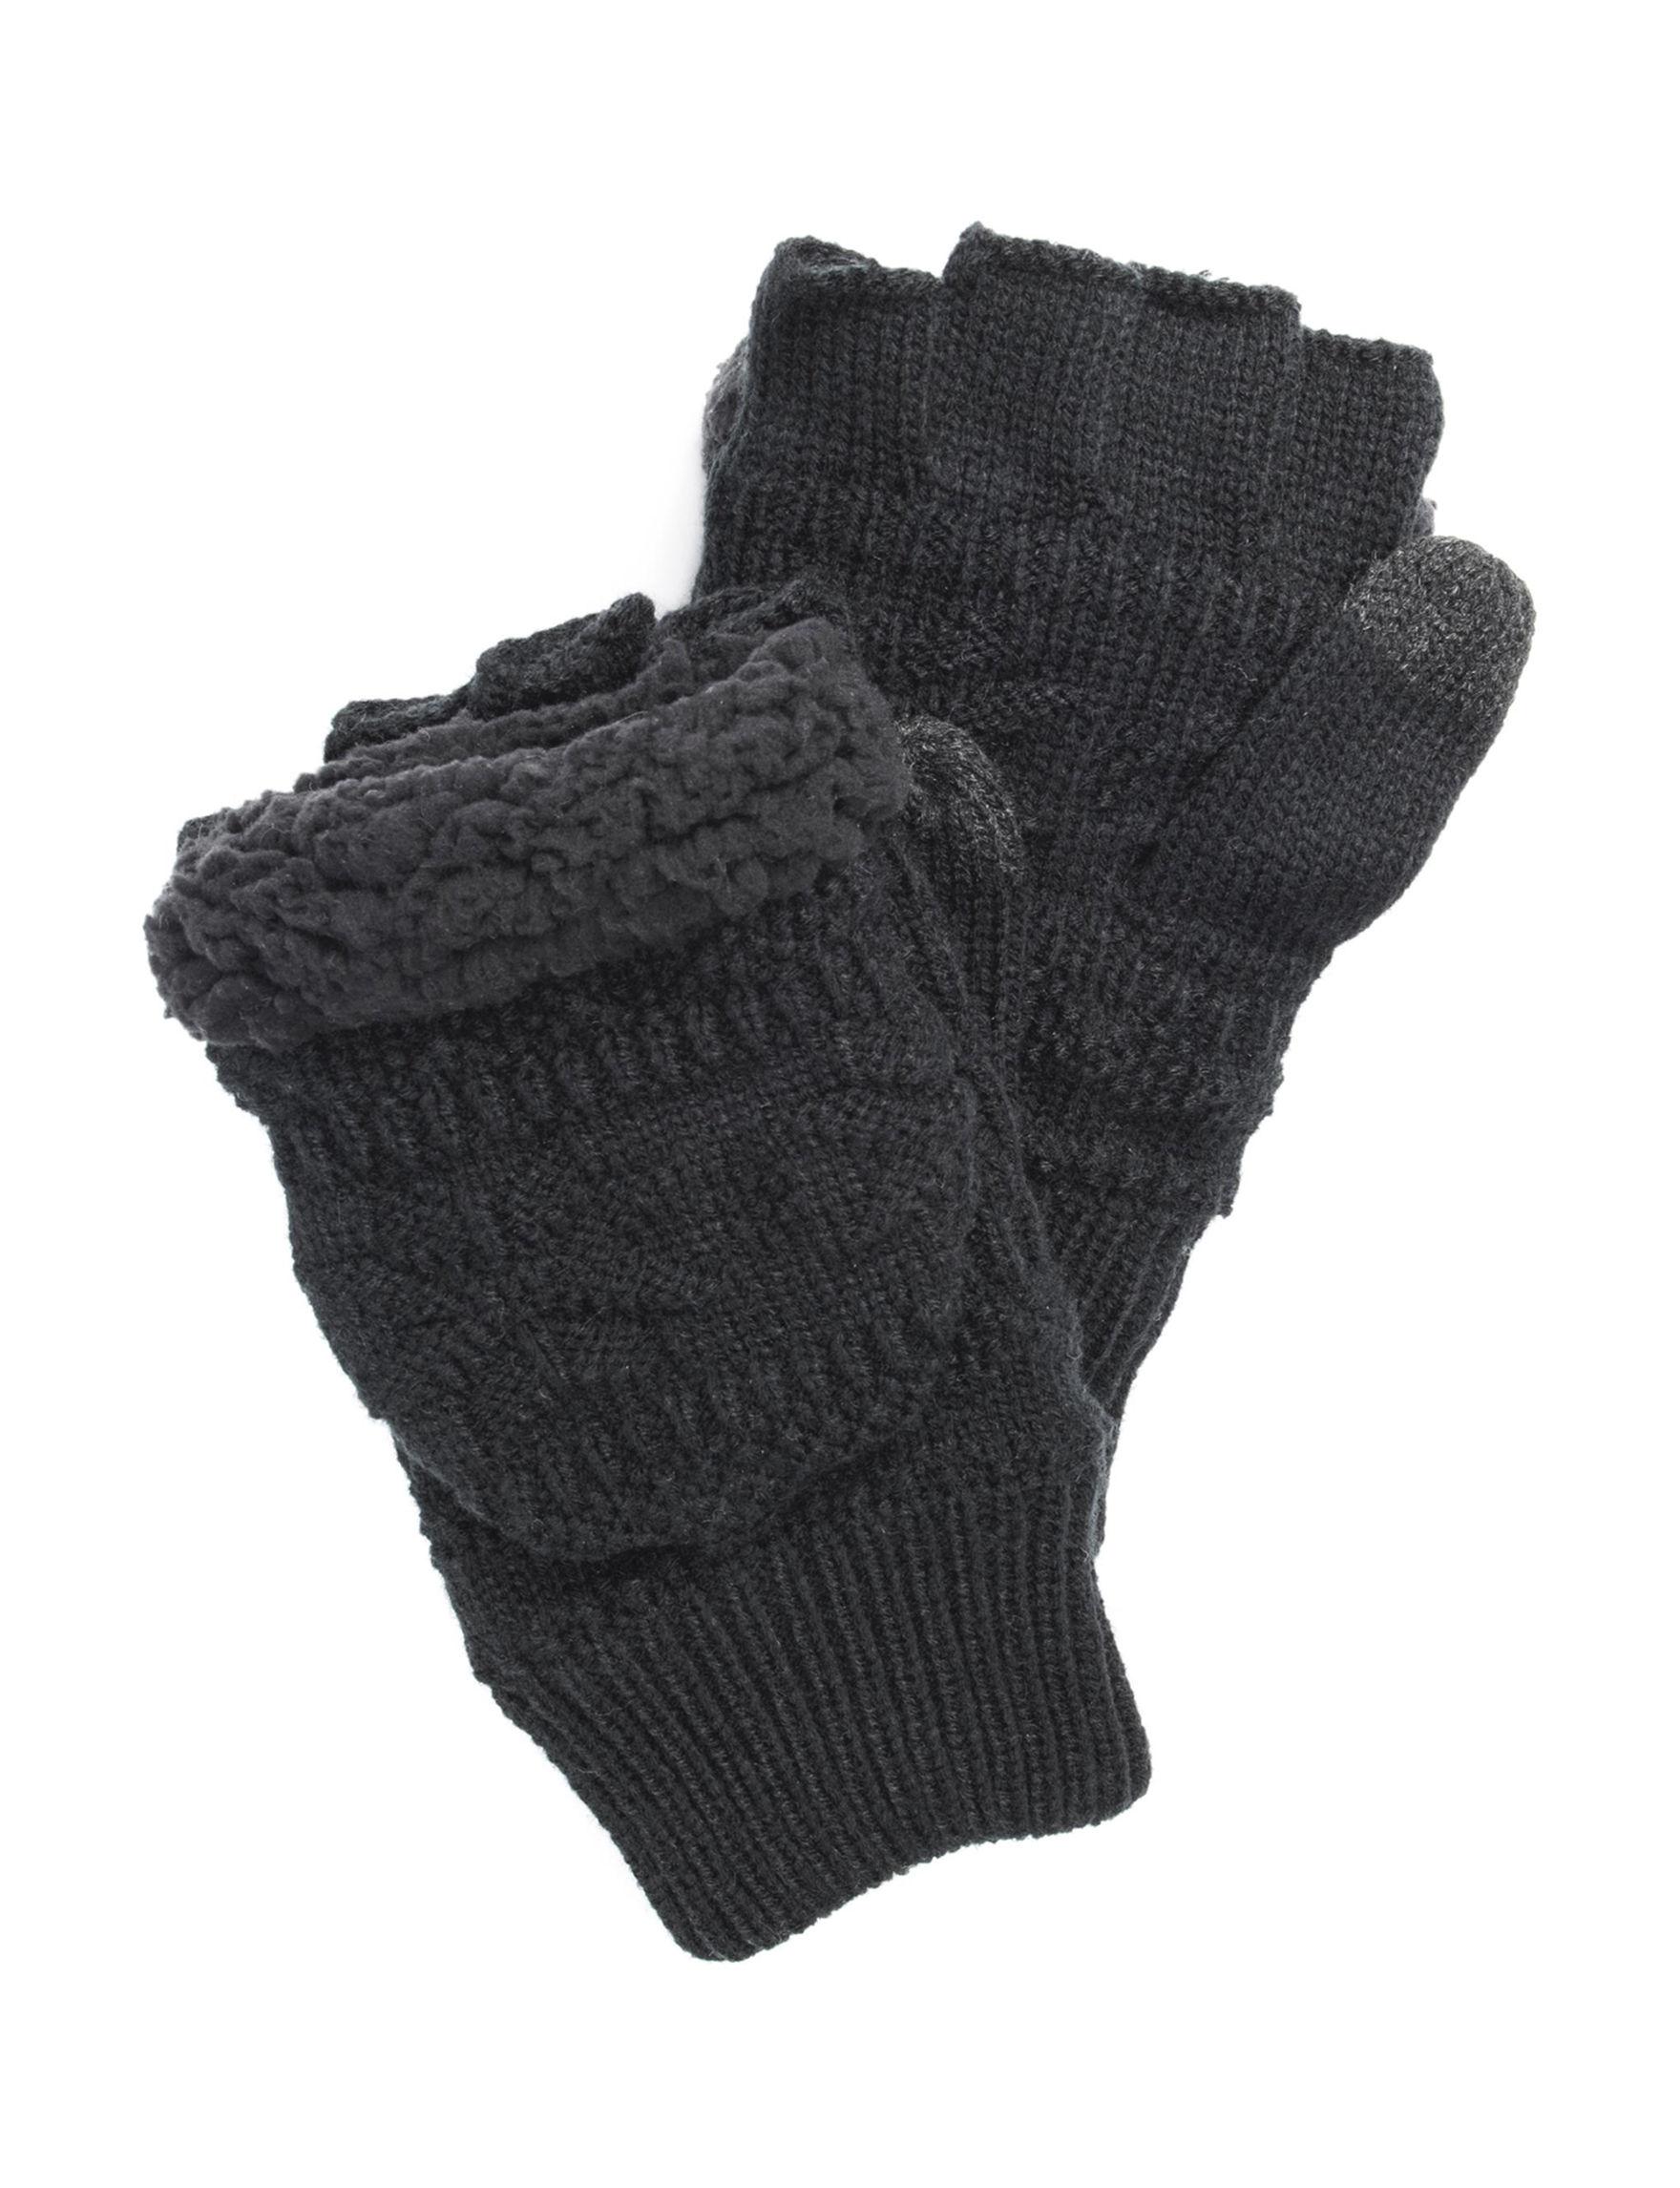 Muk Luks Black Gloves & Mittens